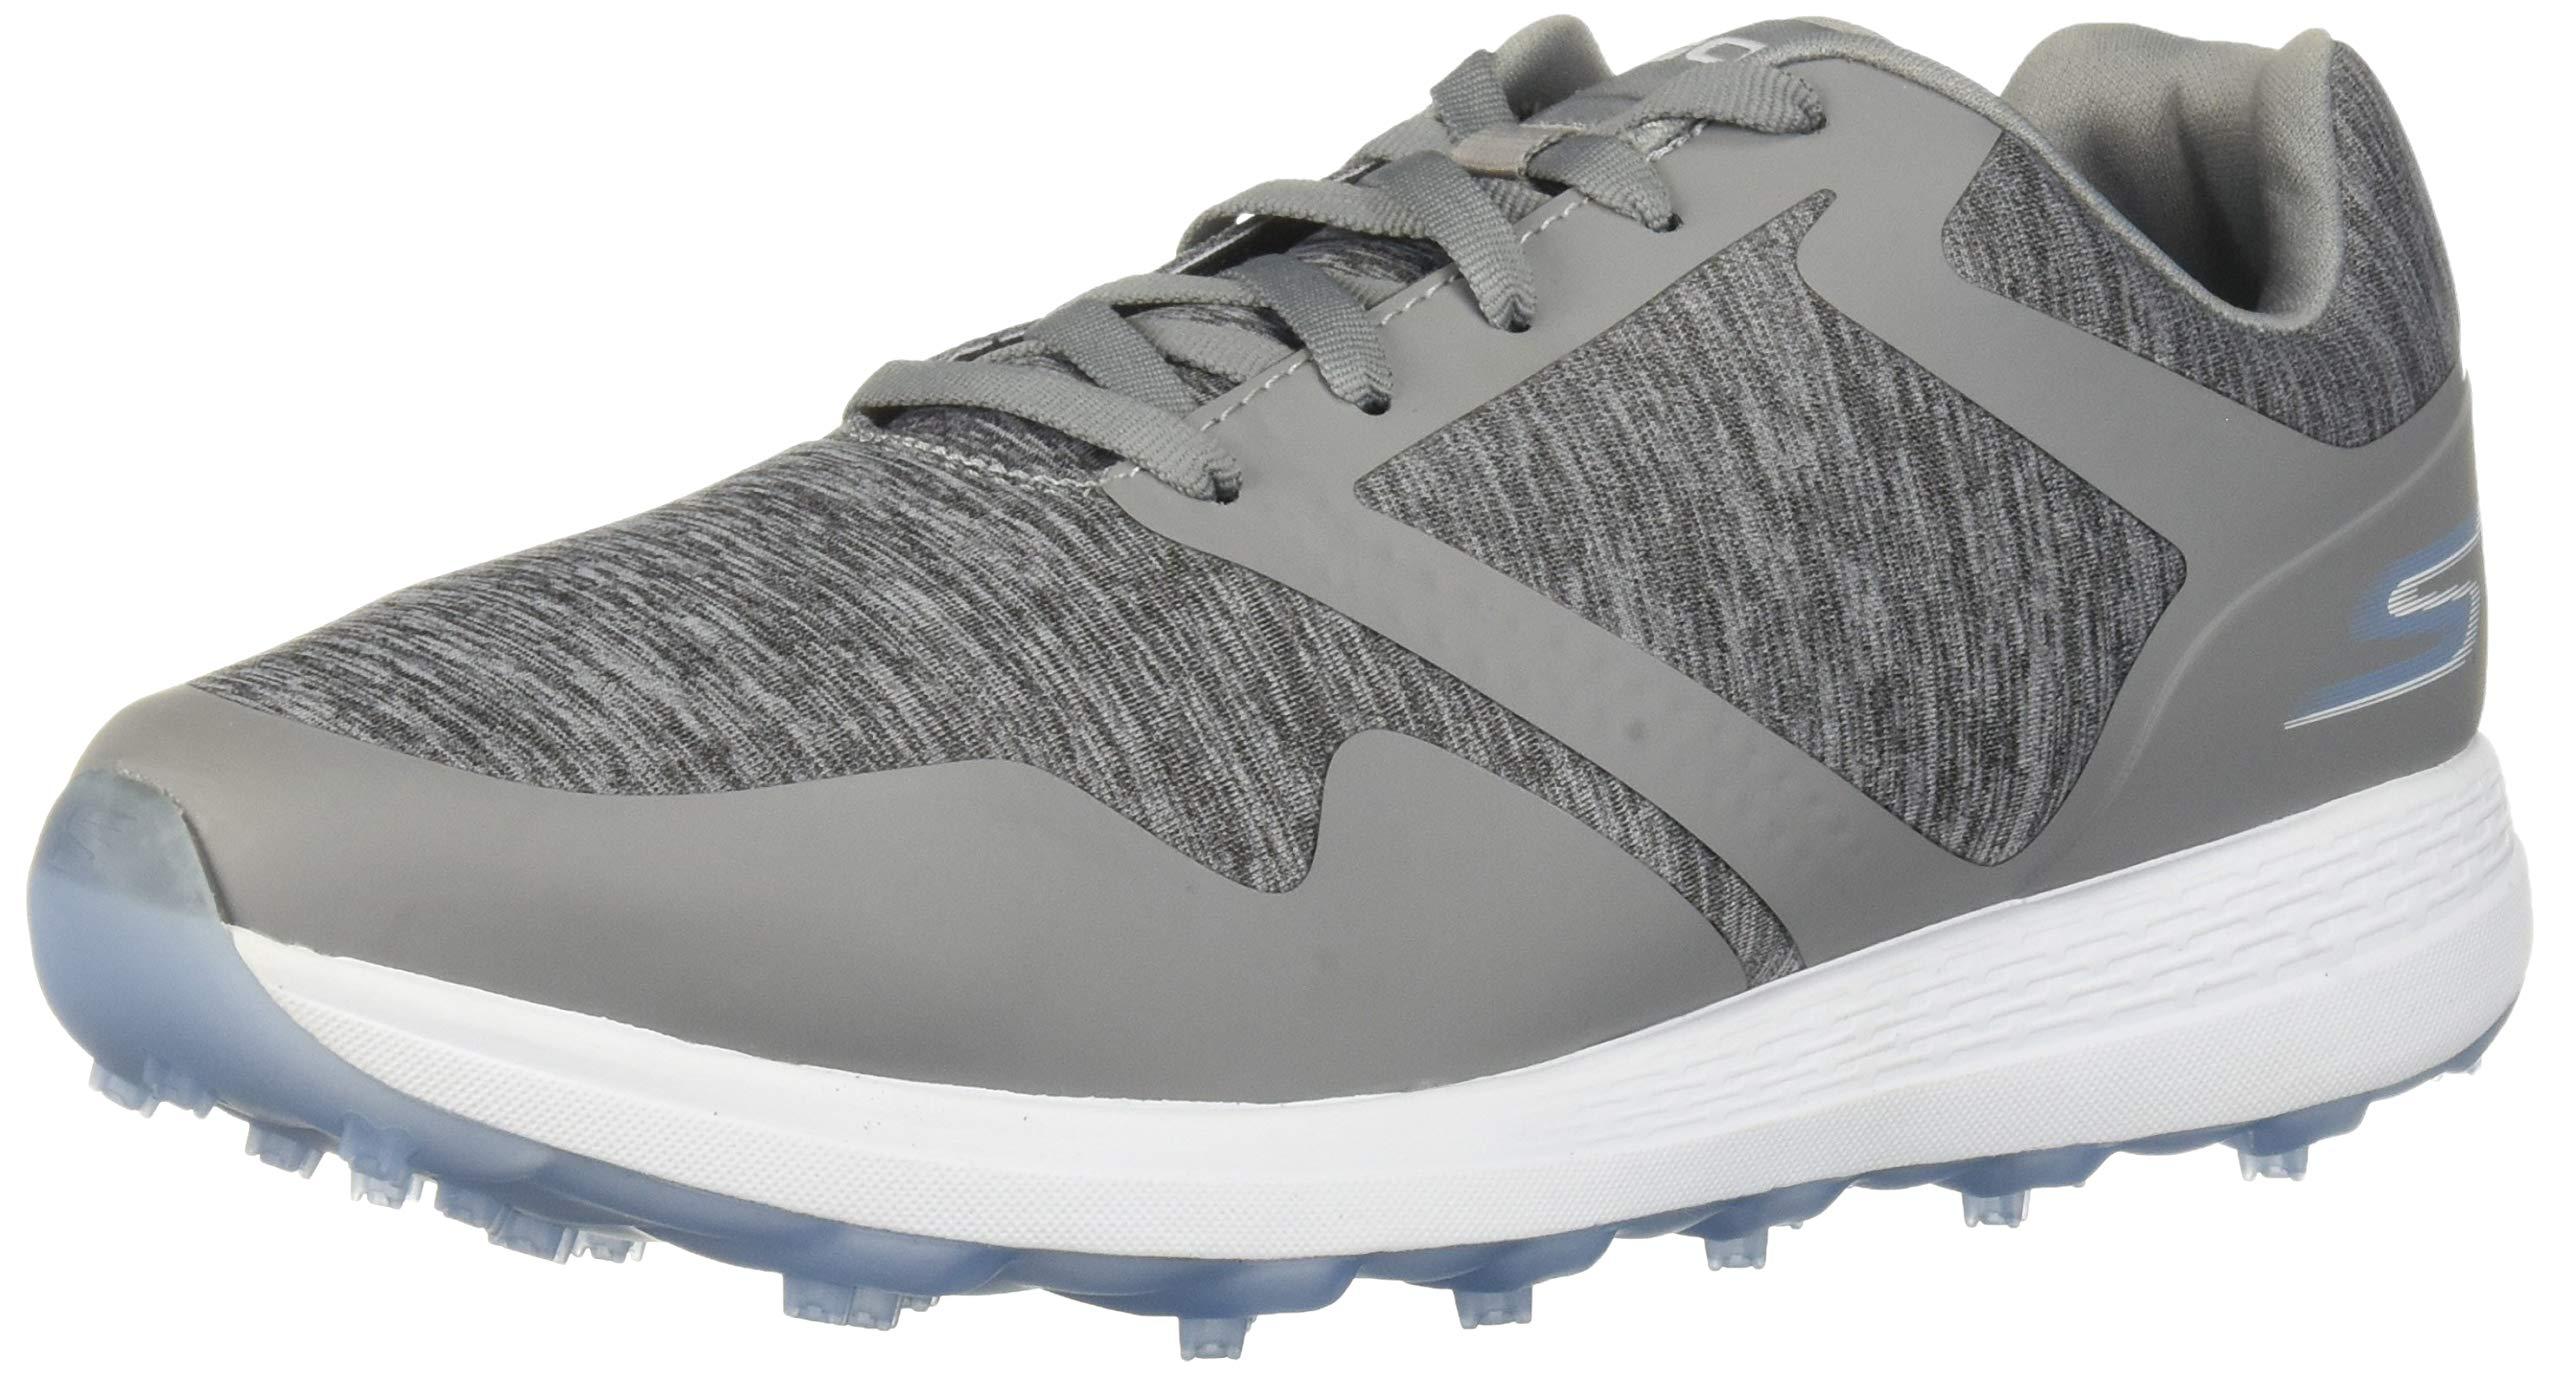 Skechers Women's Max Golf Shoe, Gray/Blue Heathered, 5.5 M US